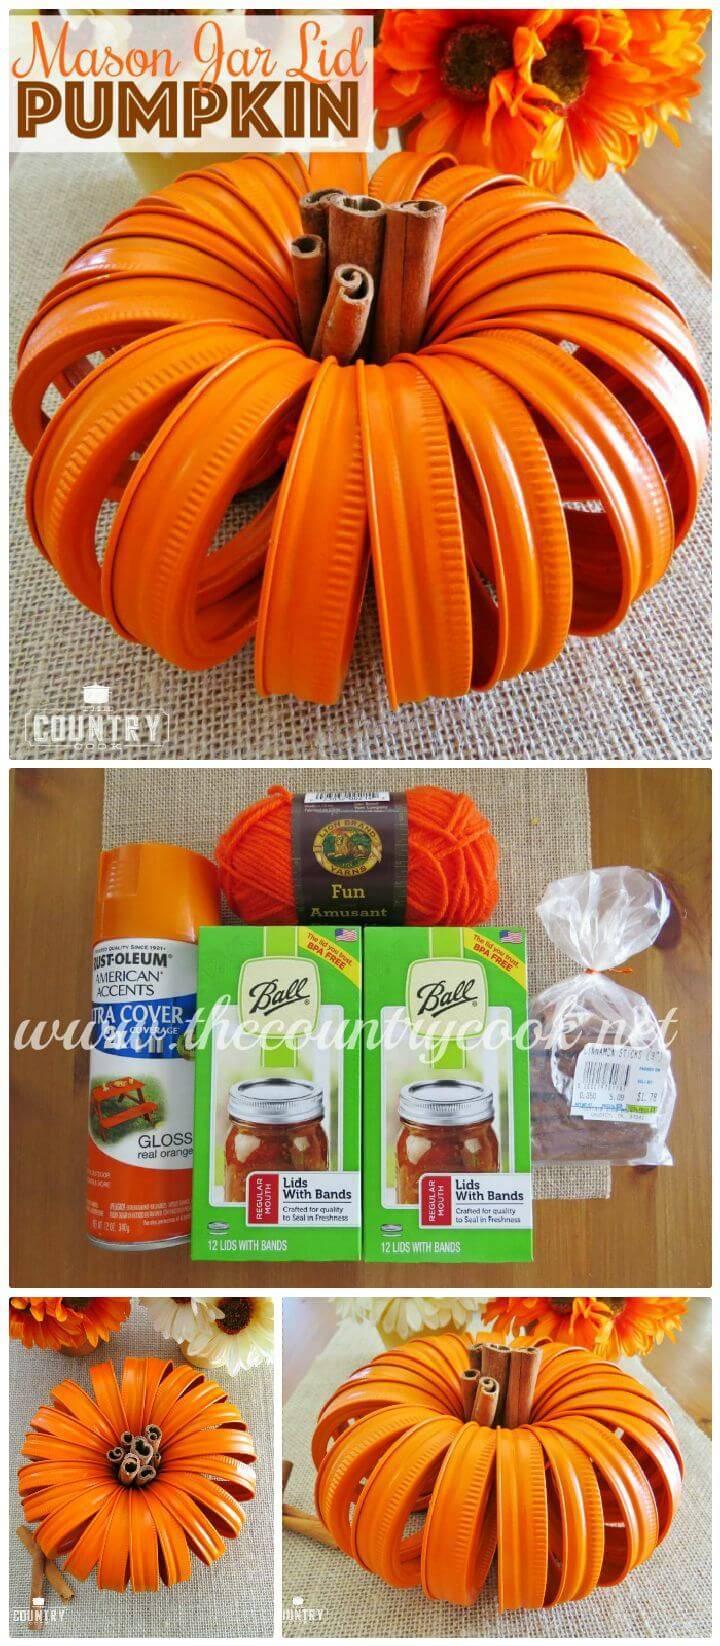 DIY Mason Jar Lid Pumpkins